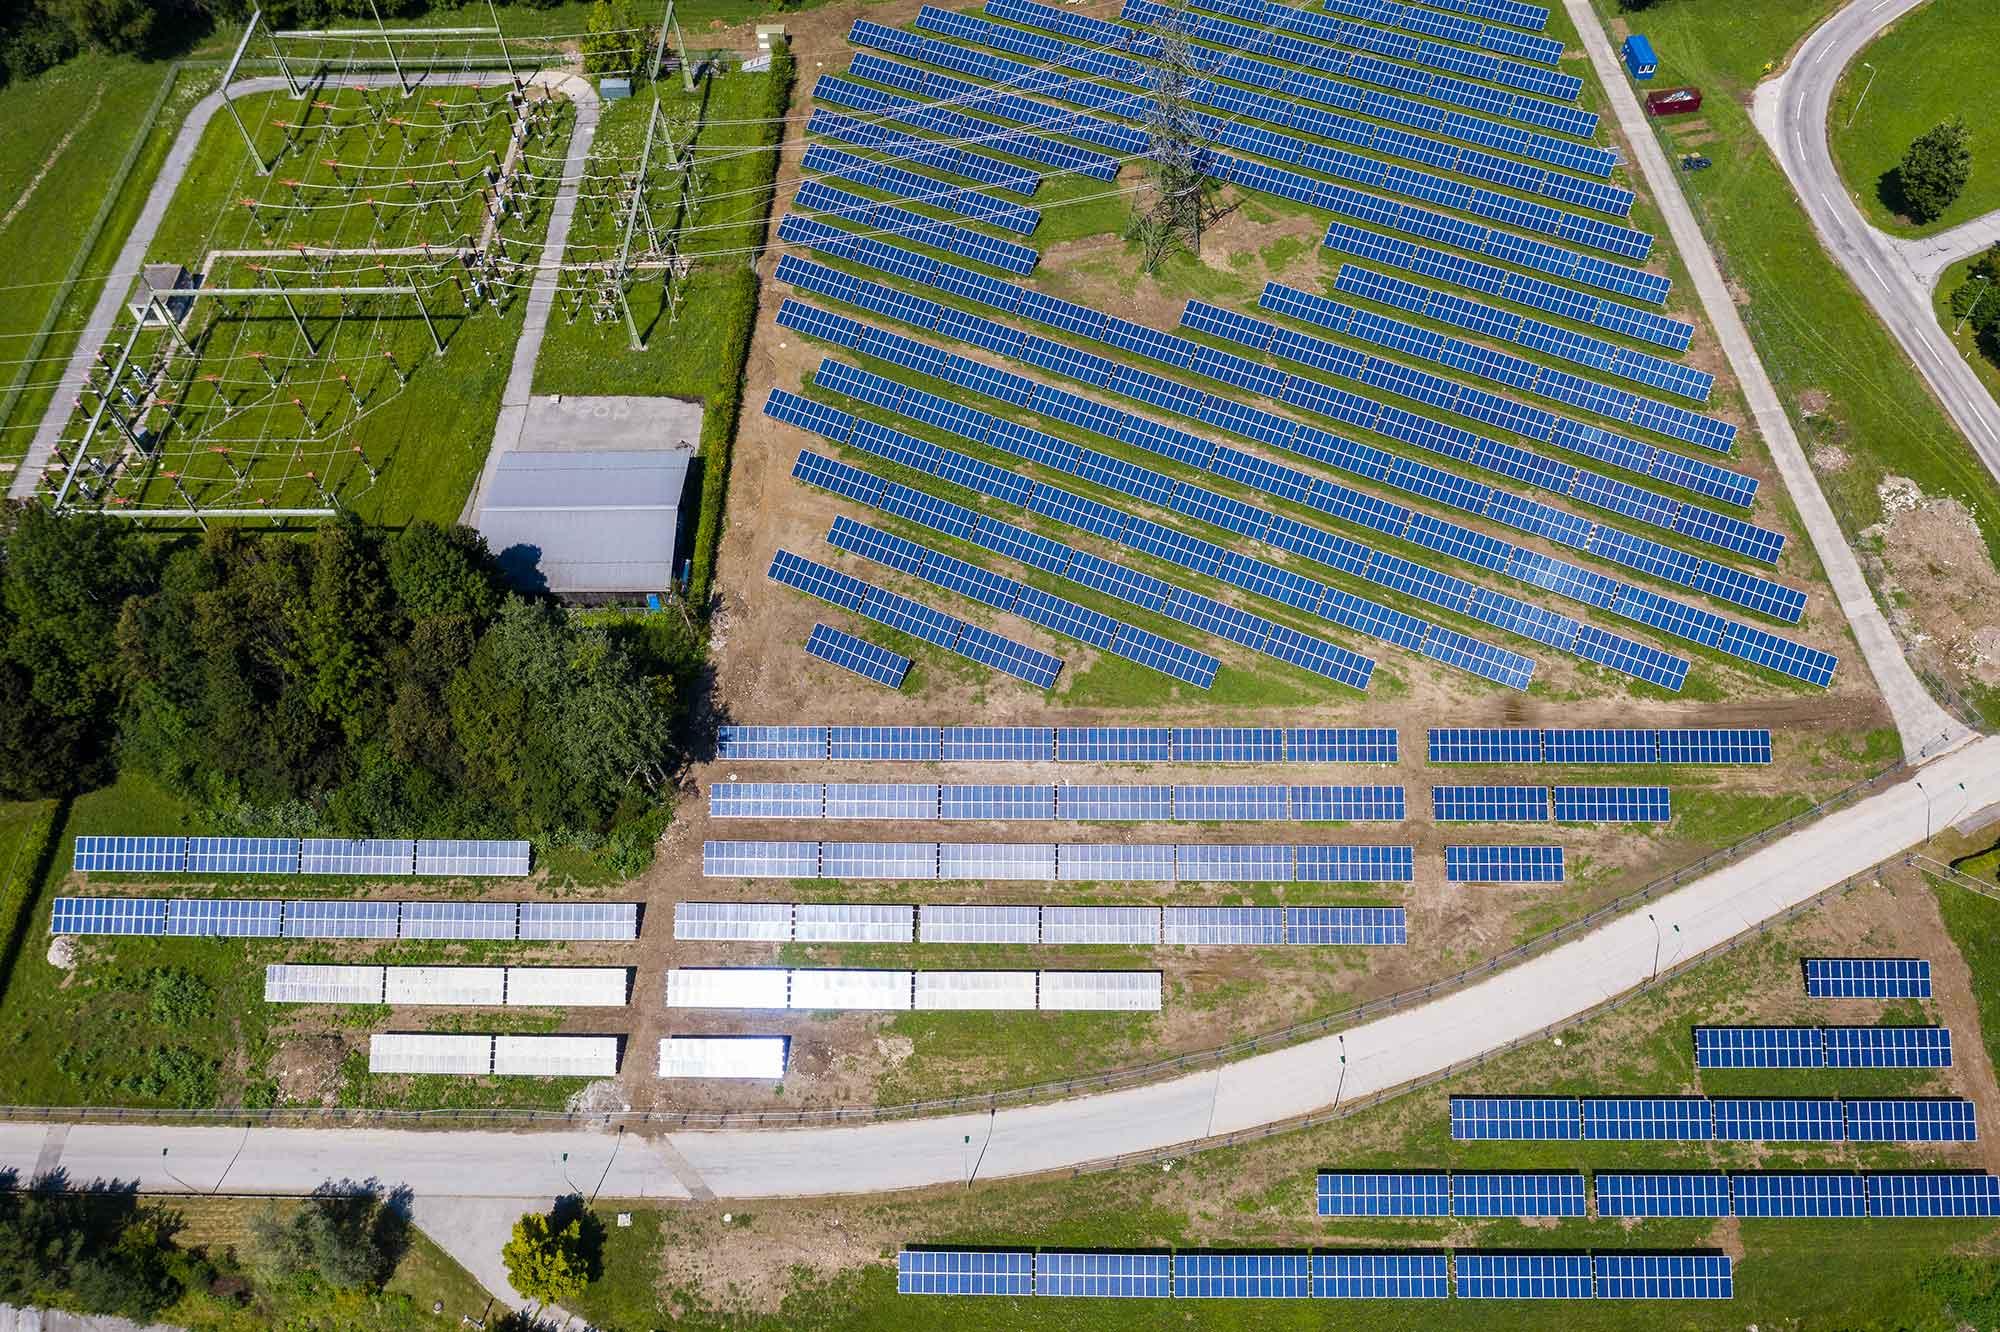 PV facility in Feistritz, photo: VERBUND AG